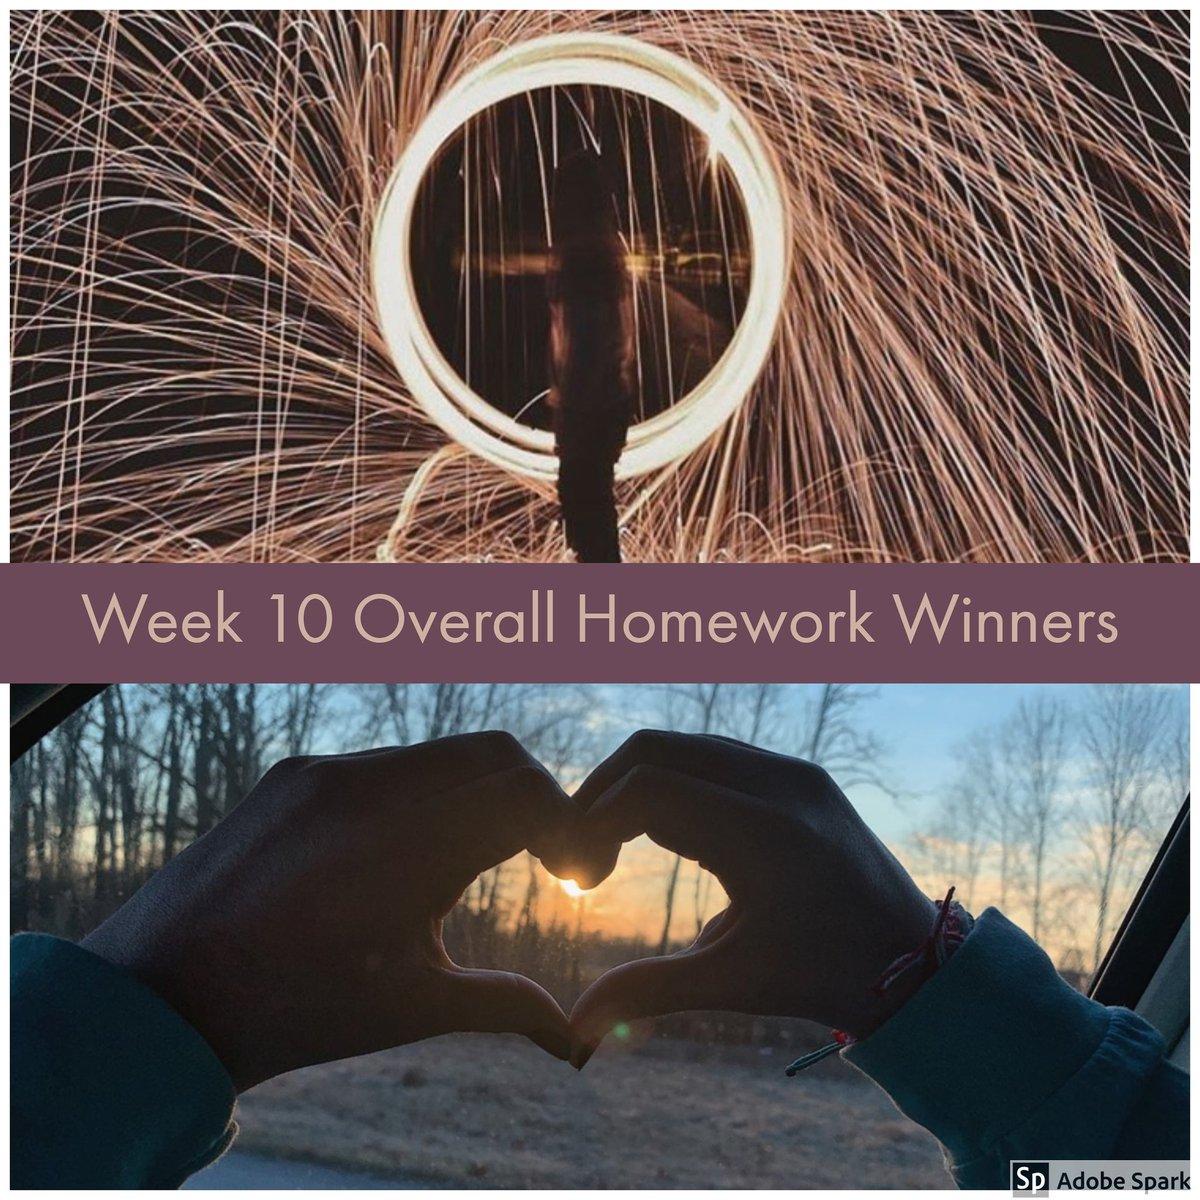 Congratulations to Sam & Elizabeth for winning this week's homework! #mhsphotography #photography #highschoolphotographer #unedited #homeworkwinners #symbolspic.twitter.com/8LYNcBxA5k